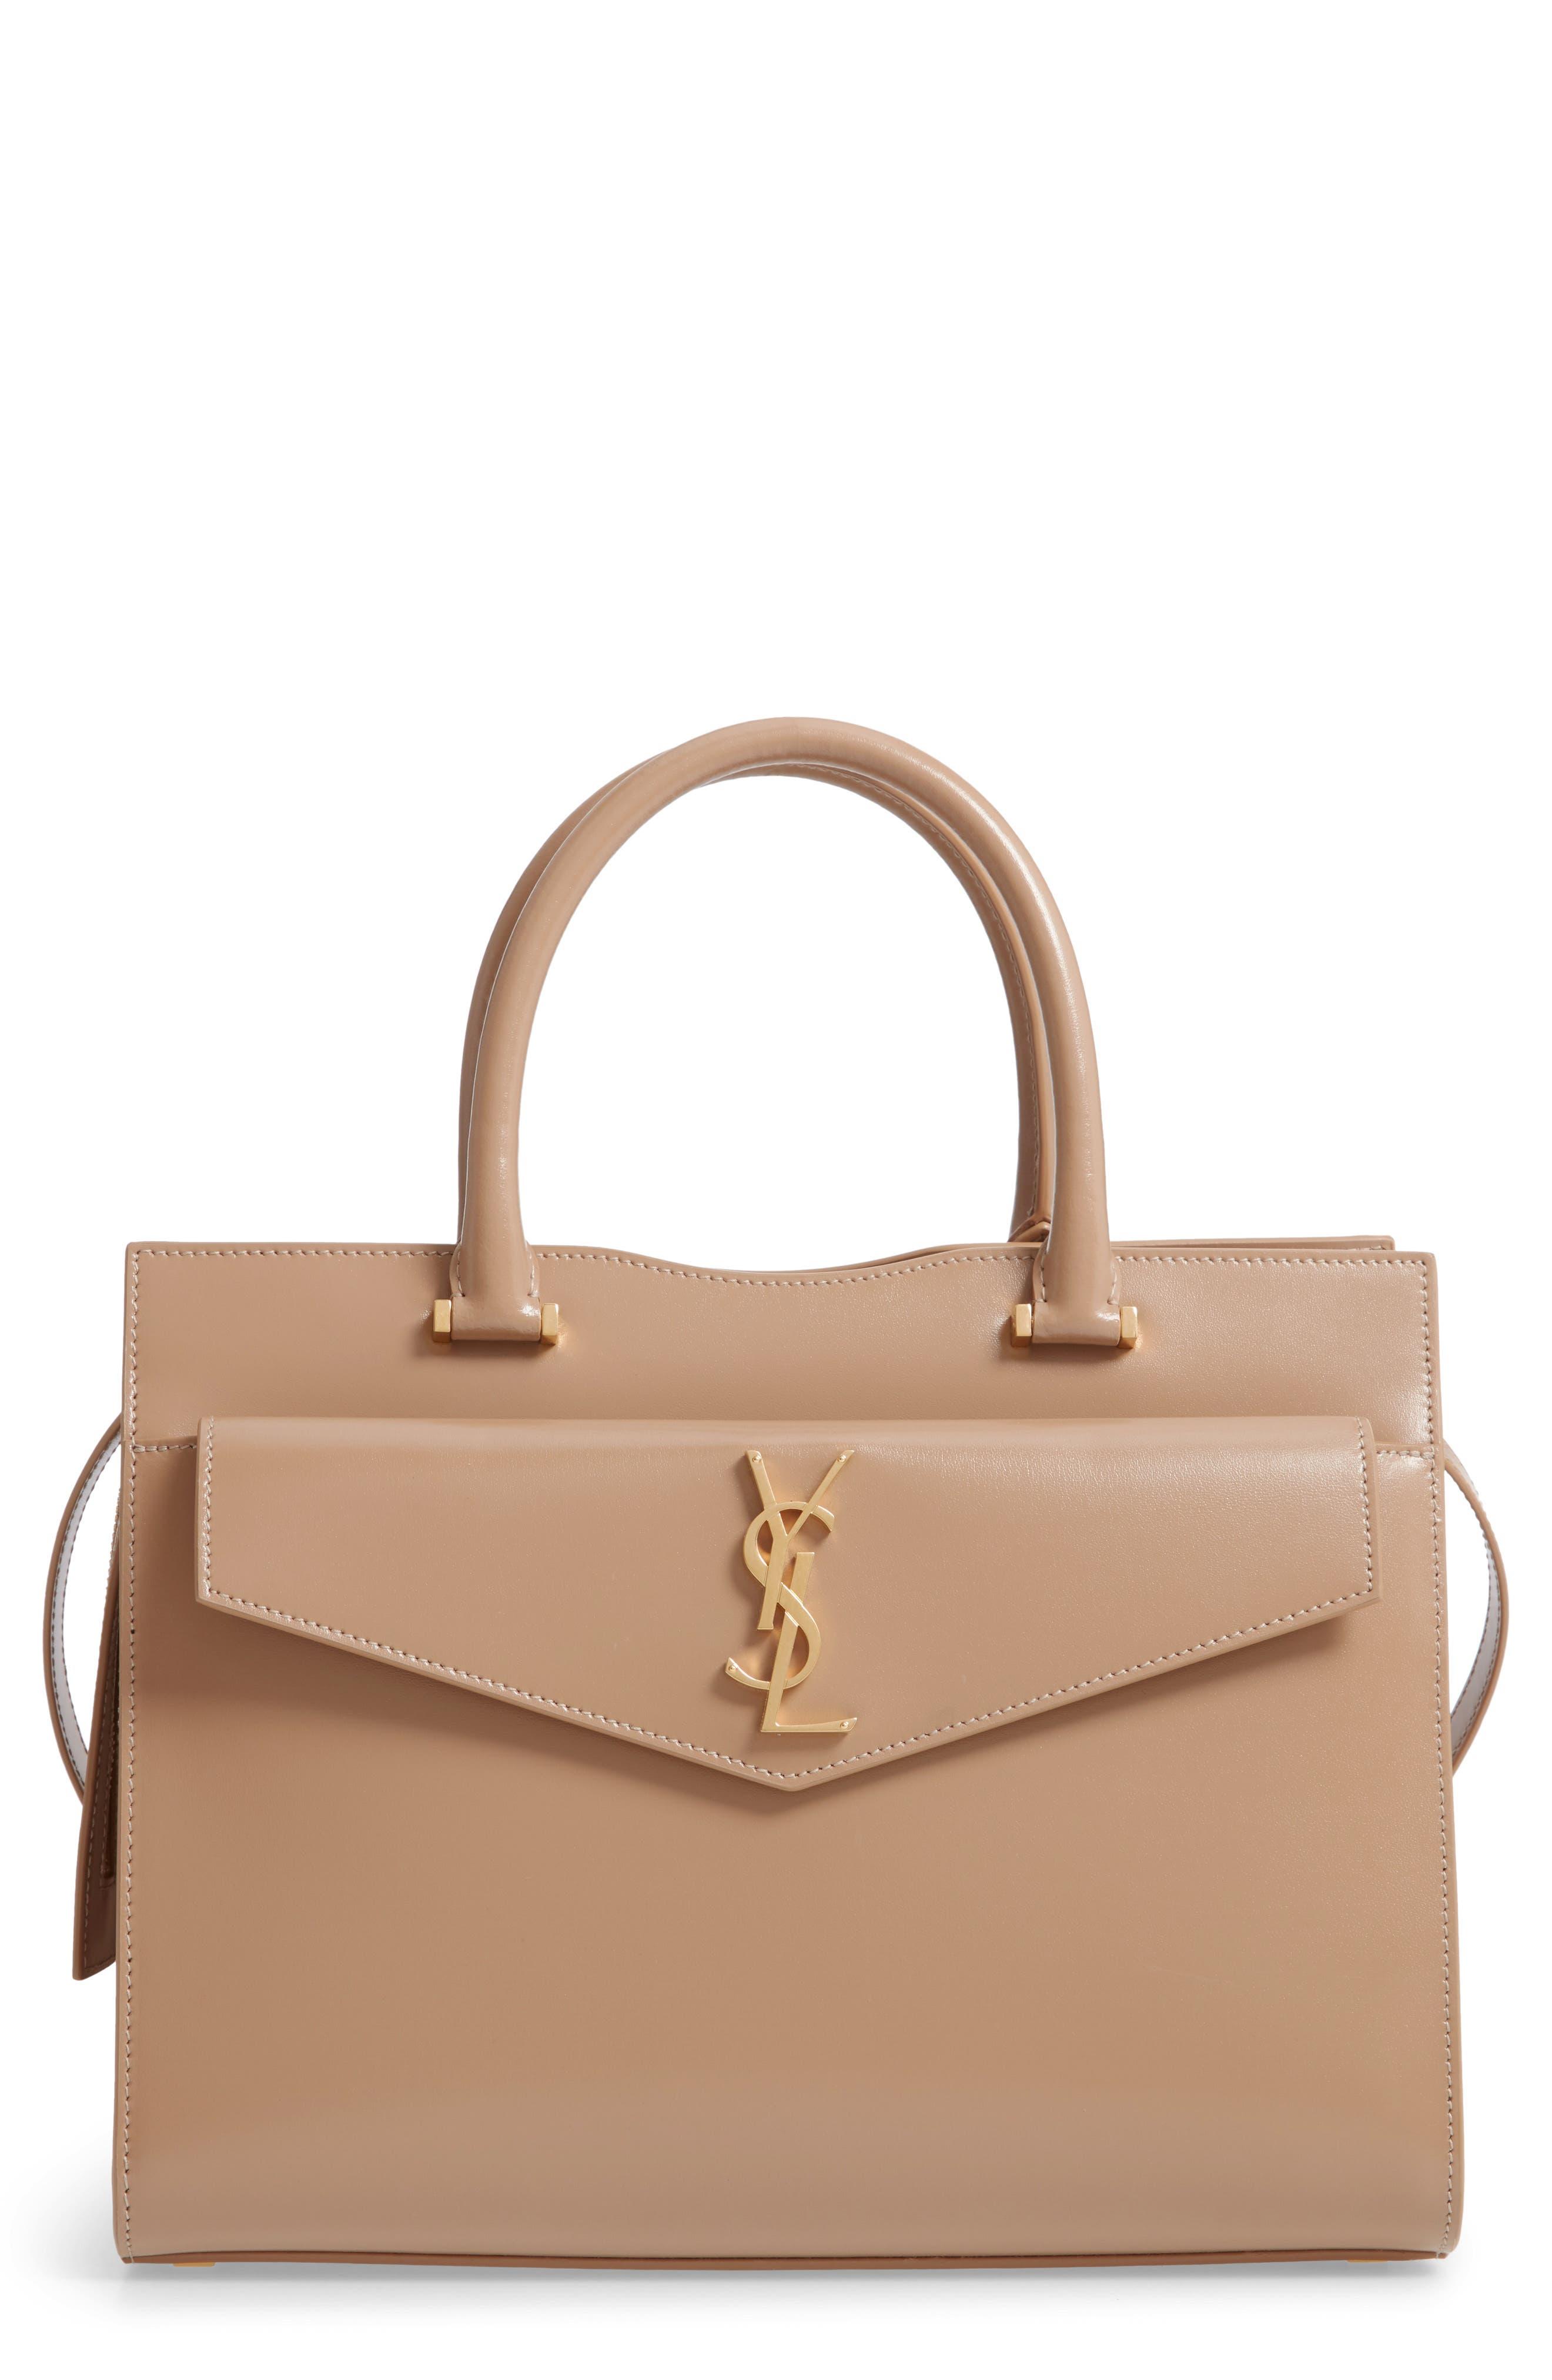 satchels handbags wallets for women nordstrom rh shop nordstrom com